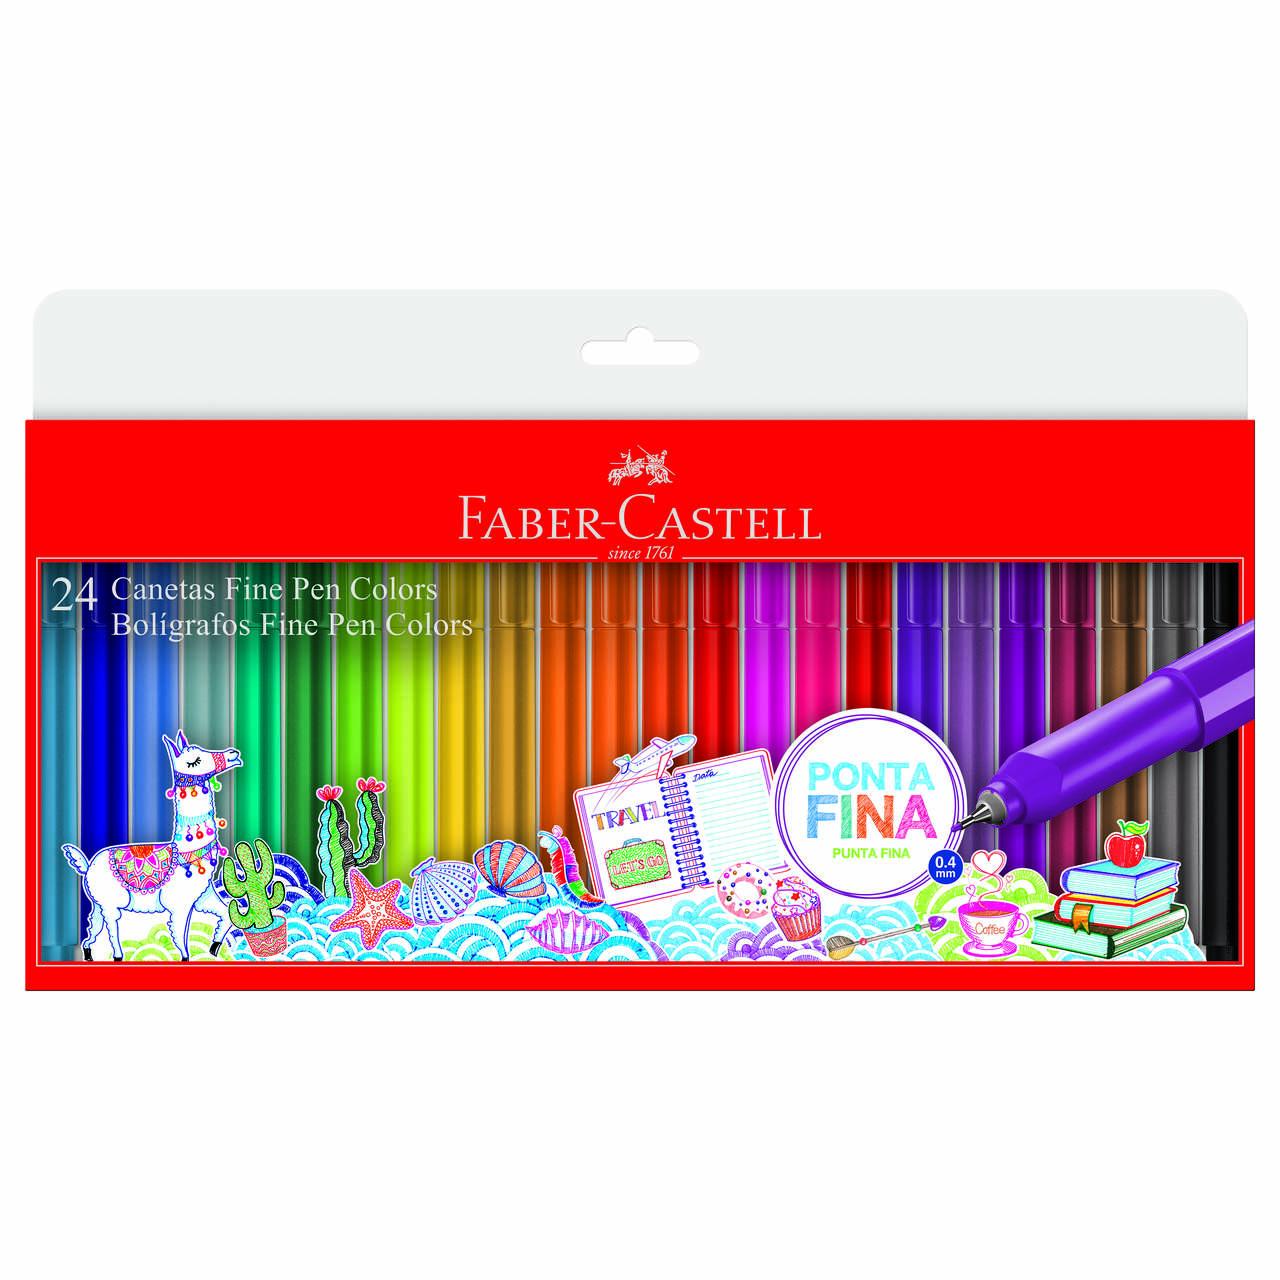 Caneta Hidrográfica 0.4 24 cores FINE PEN Faber-Castell